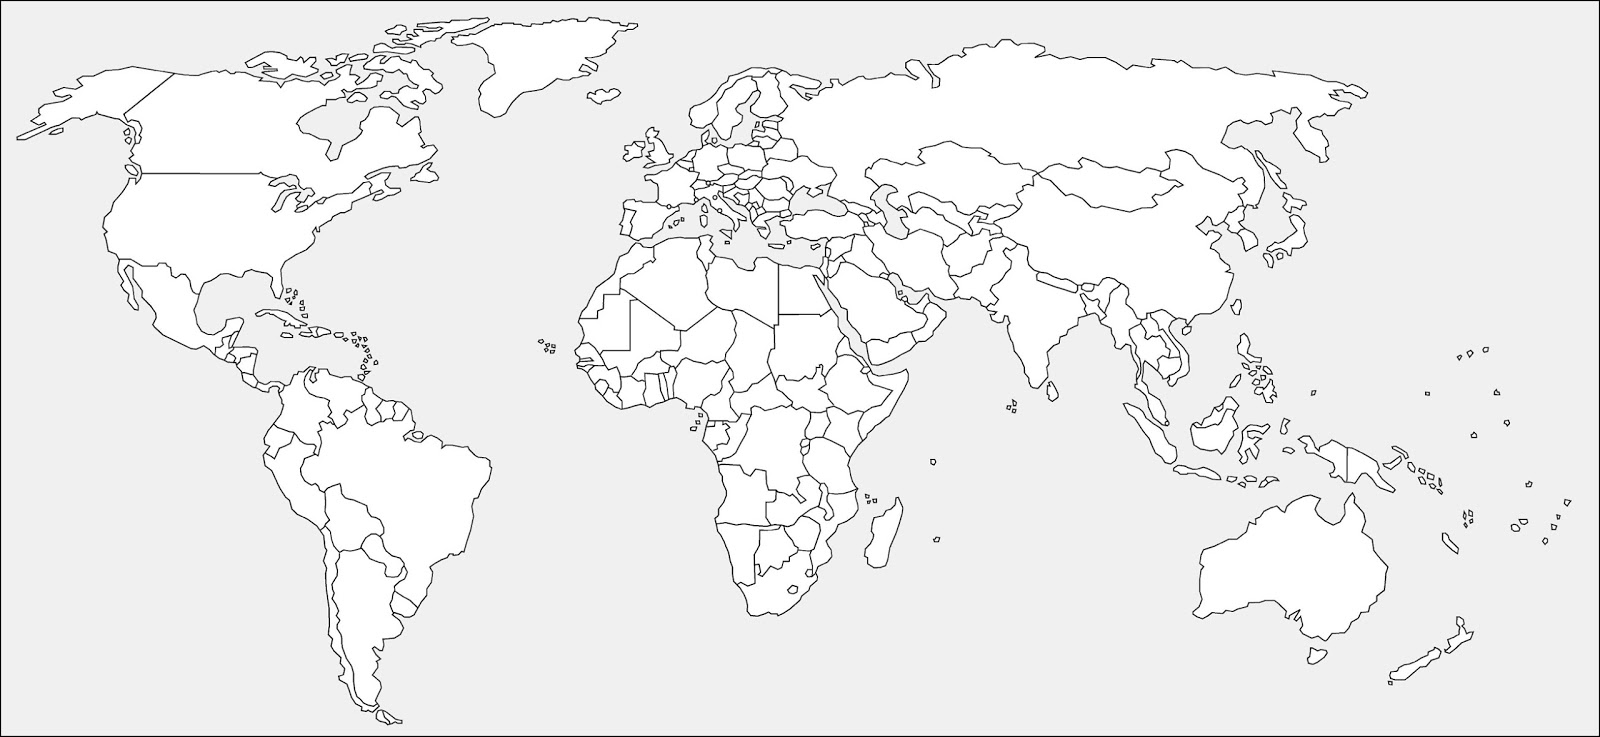 best mapa politico del mundo para imprimir pdf image collection